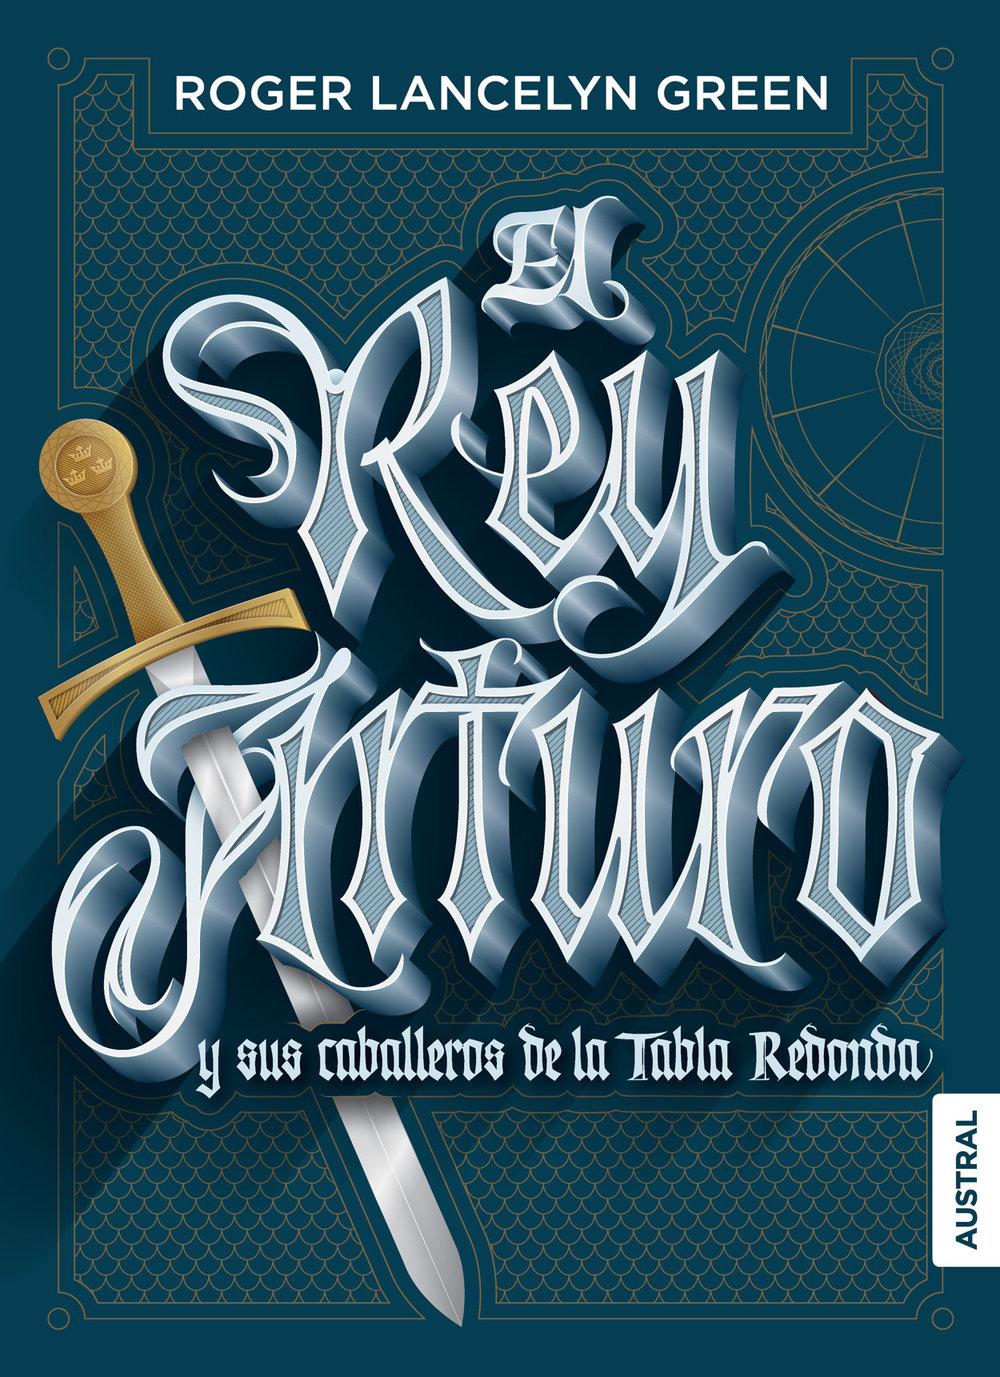 King-Arthur-Lettering-Book-Cover-Joan-Quiros.jpg